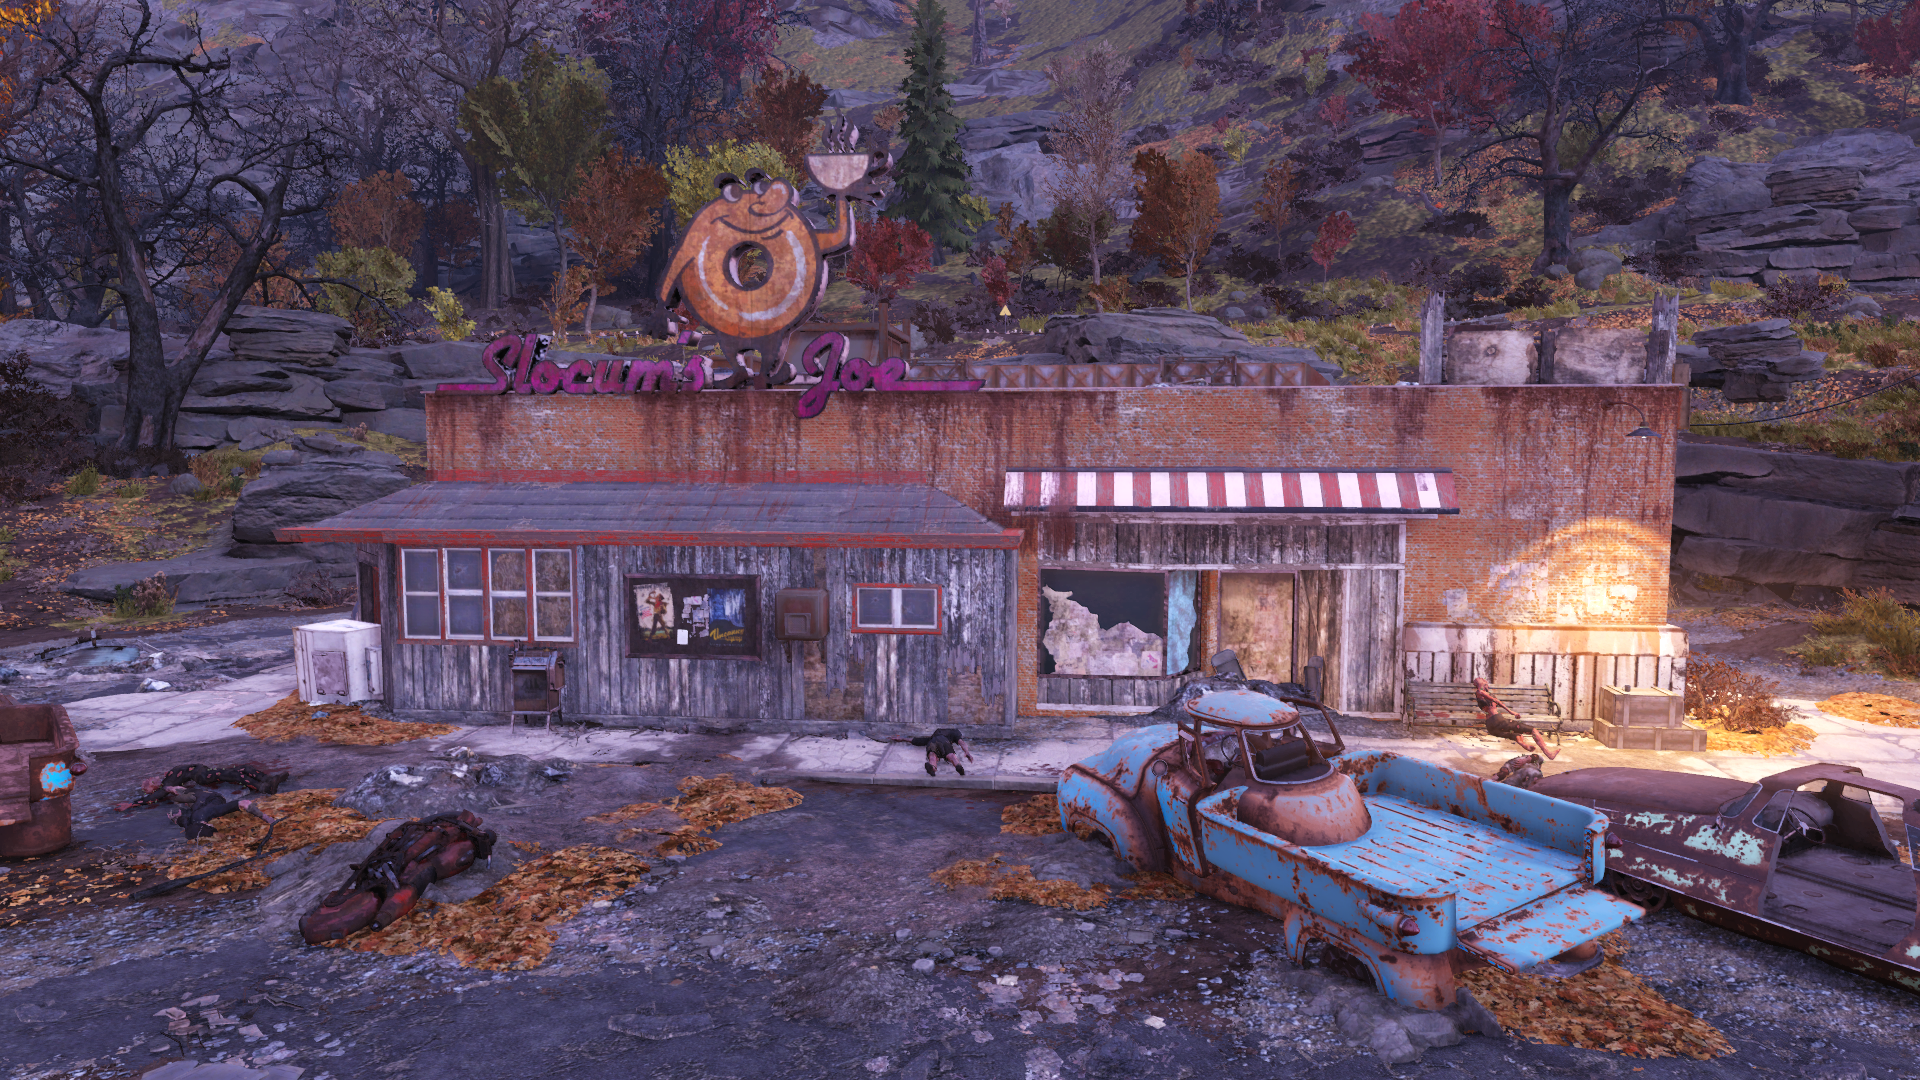 Slocum S Joe Fallout 76 Fallout Wiki Fandom Powered By Wikia